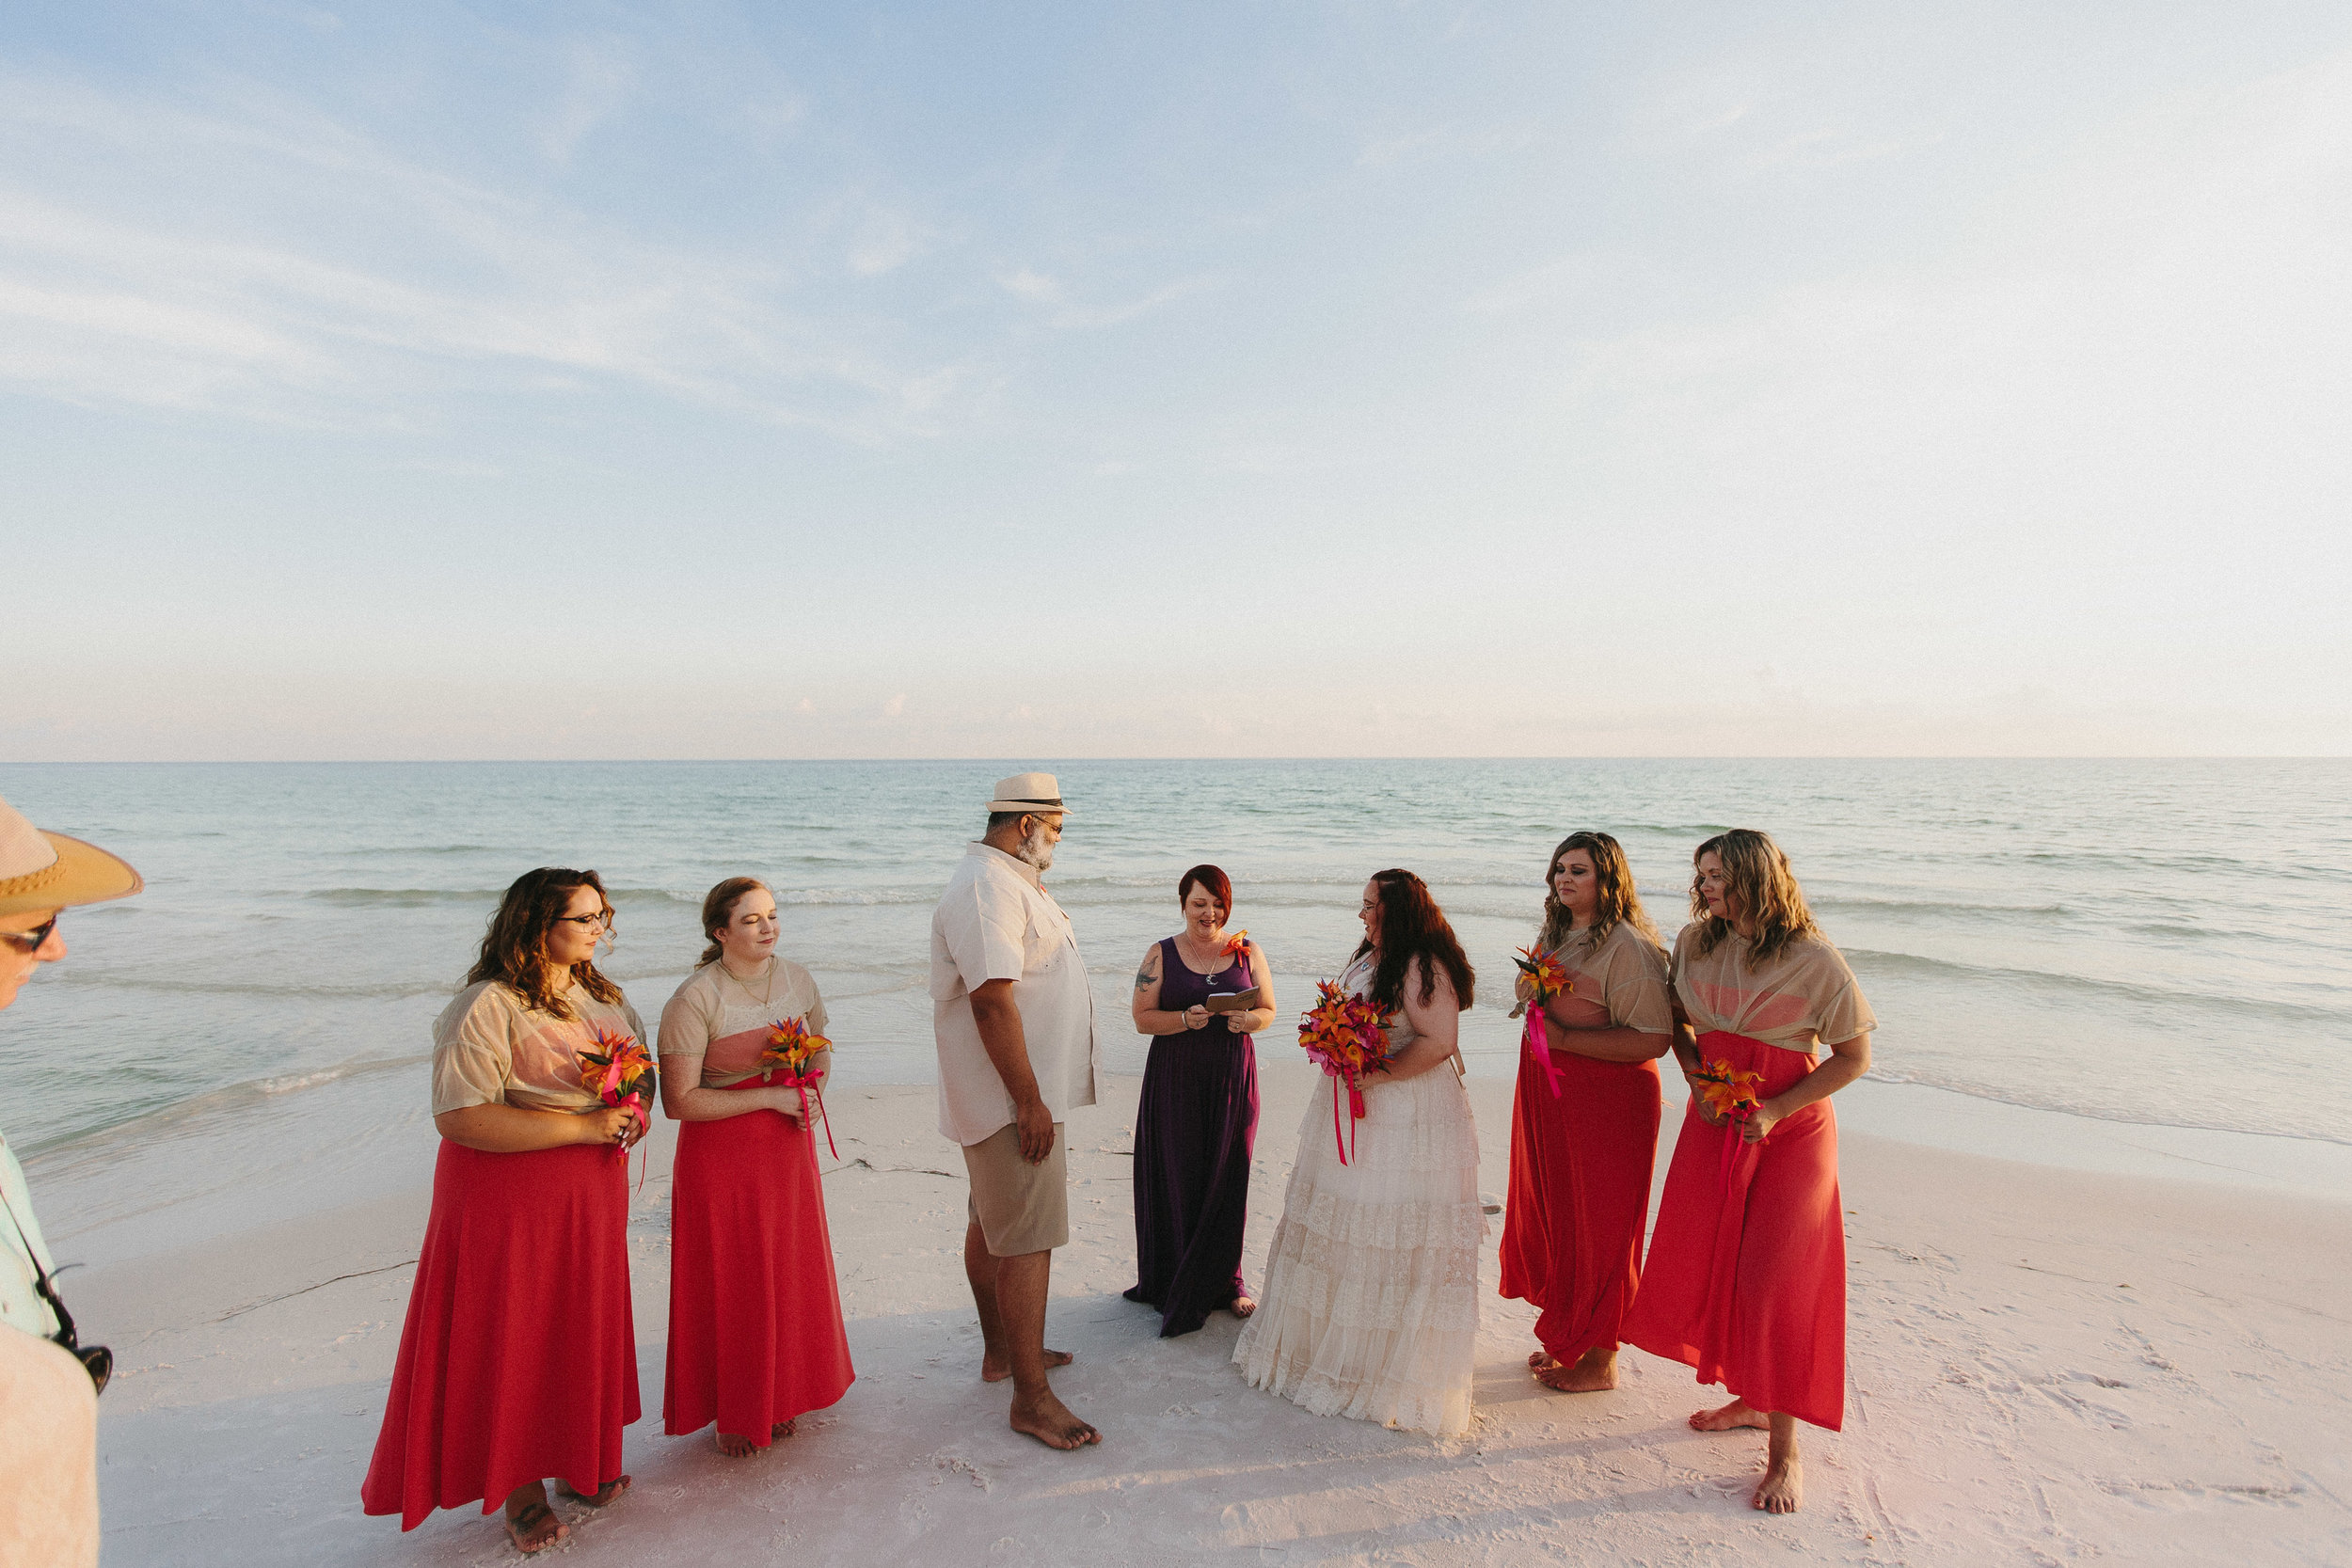 destin_sunset_beach_elopement_intimate_wedding_photographer_florida_documentary_1154.jpg